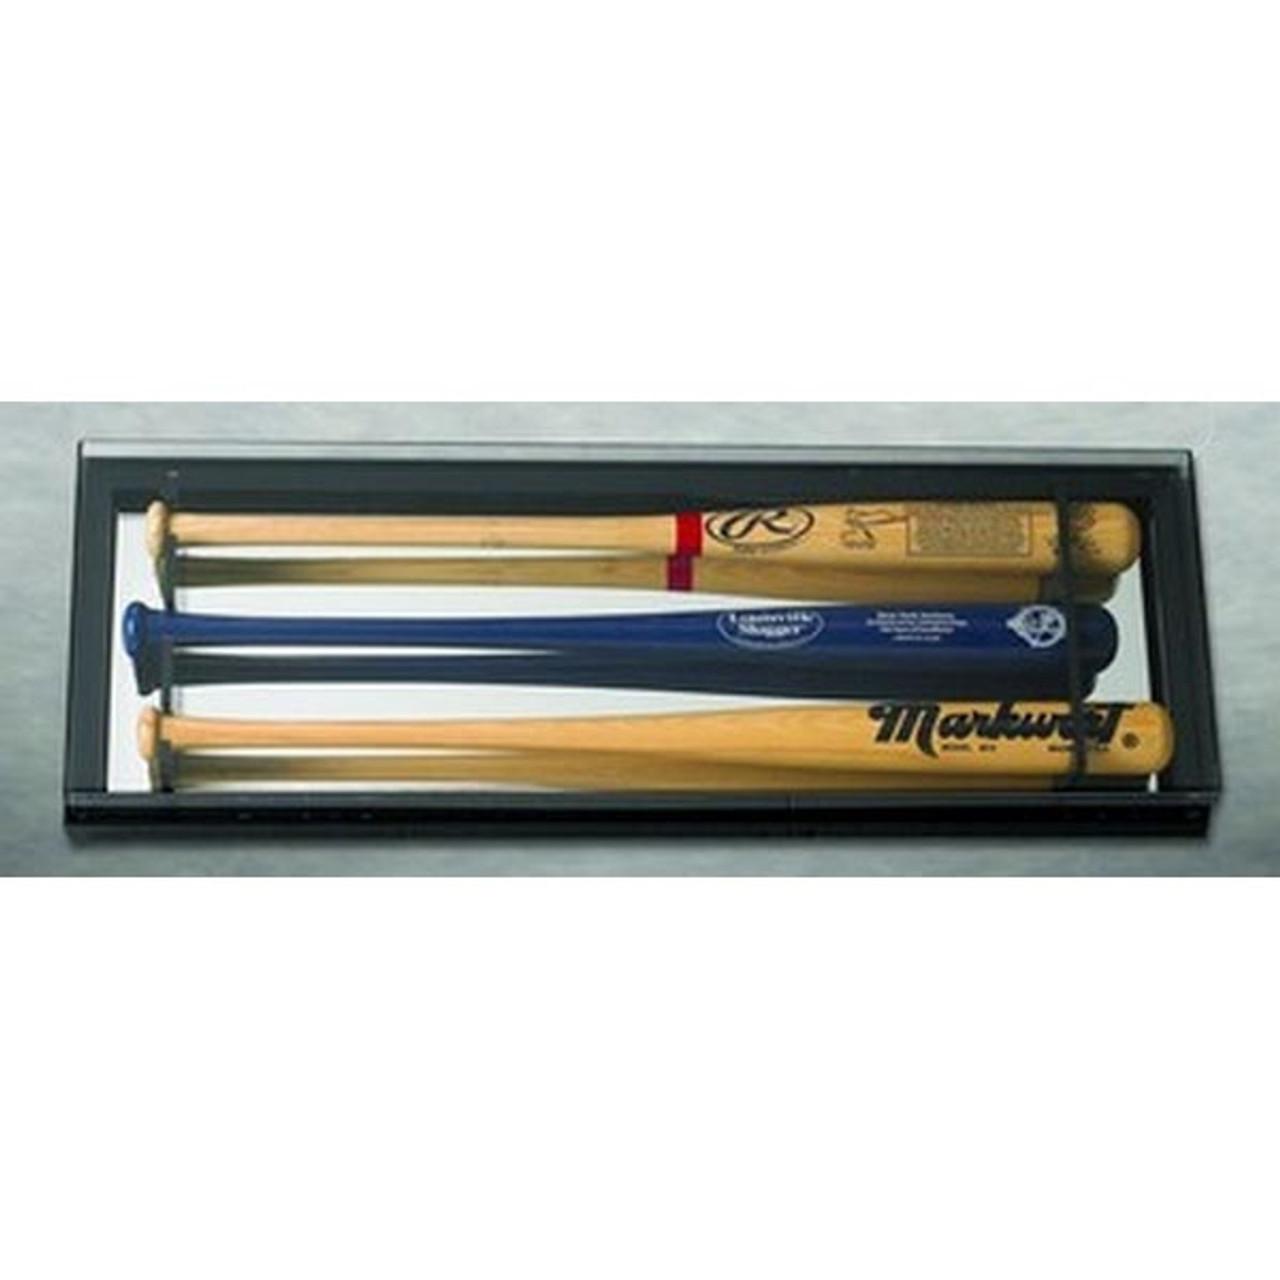 d813a8bbf46 Elite 3 Baseball Bat Display Case with Mirrored Back